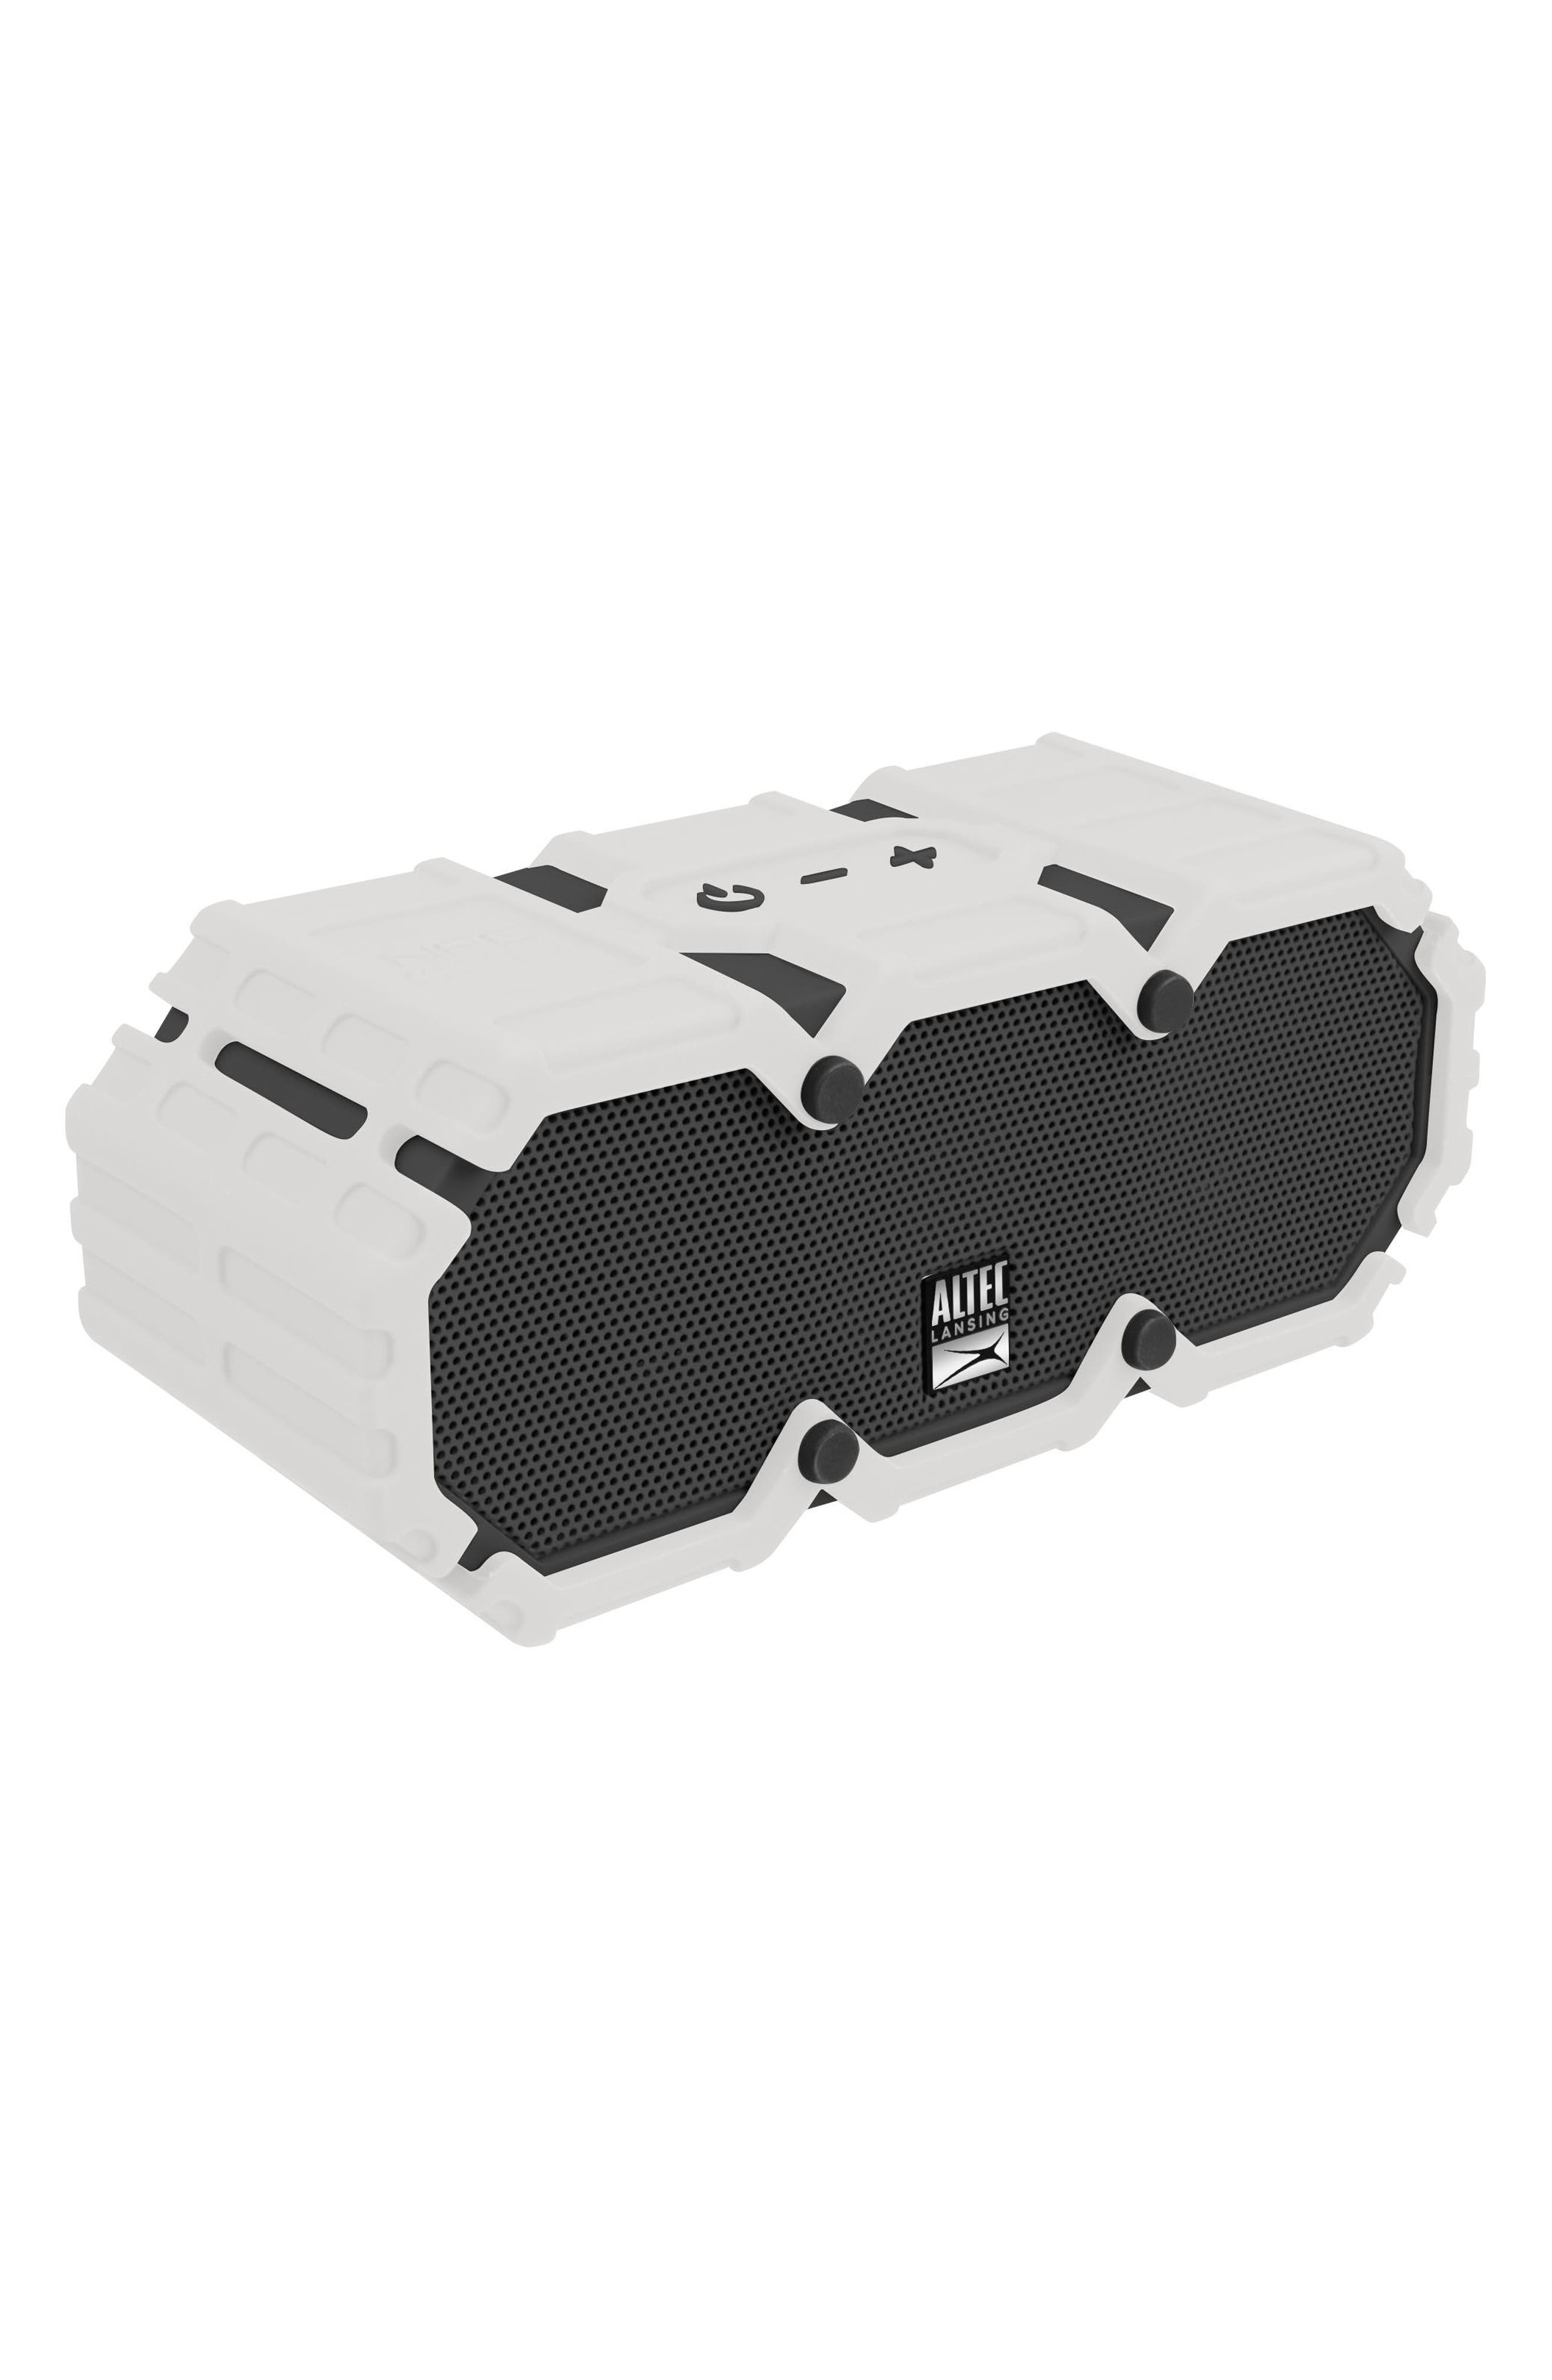 Mini Lifejacket S3 Waterproof Wireless Speaker,                             Alternate thumbnail 2, color,                             WHITE/ GRAPHITE